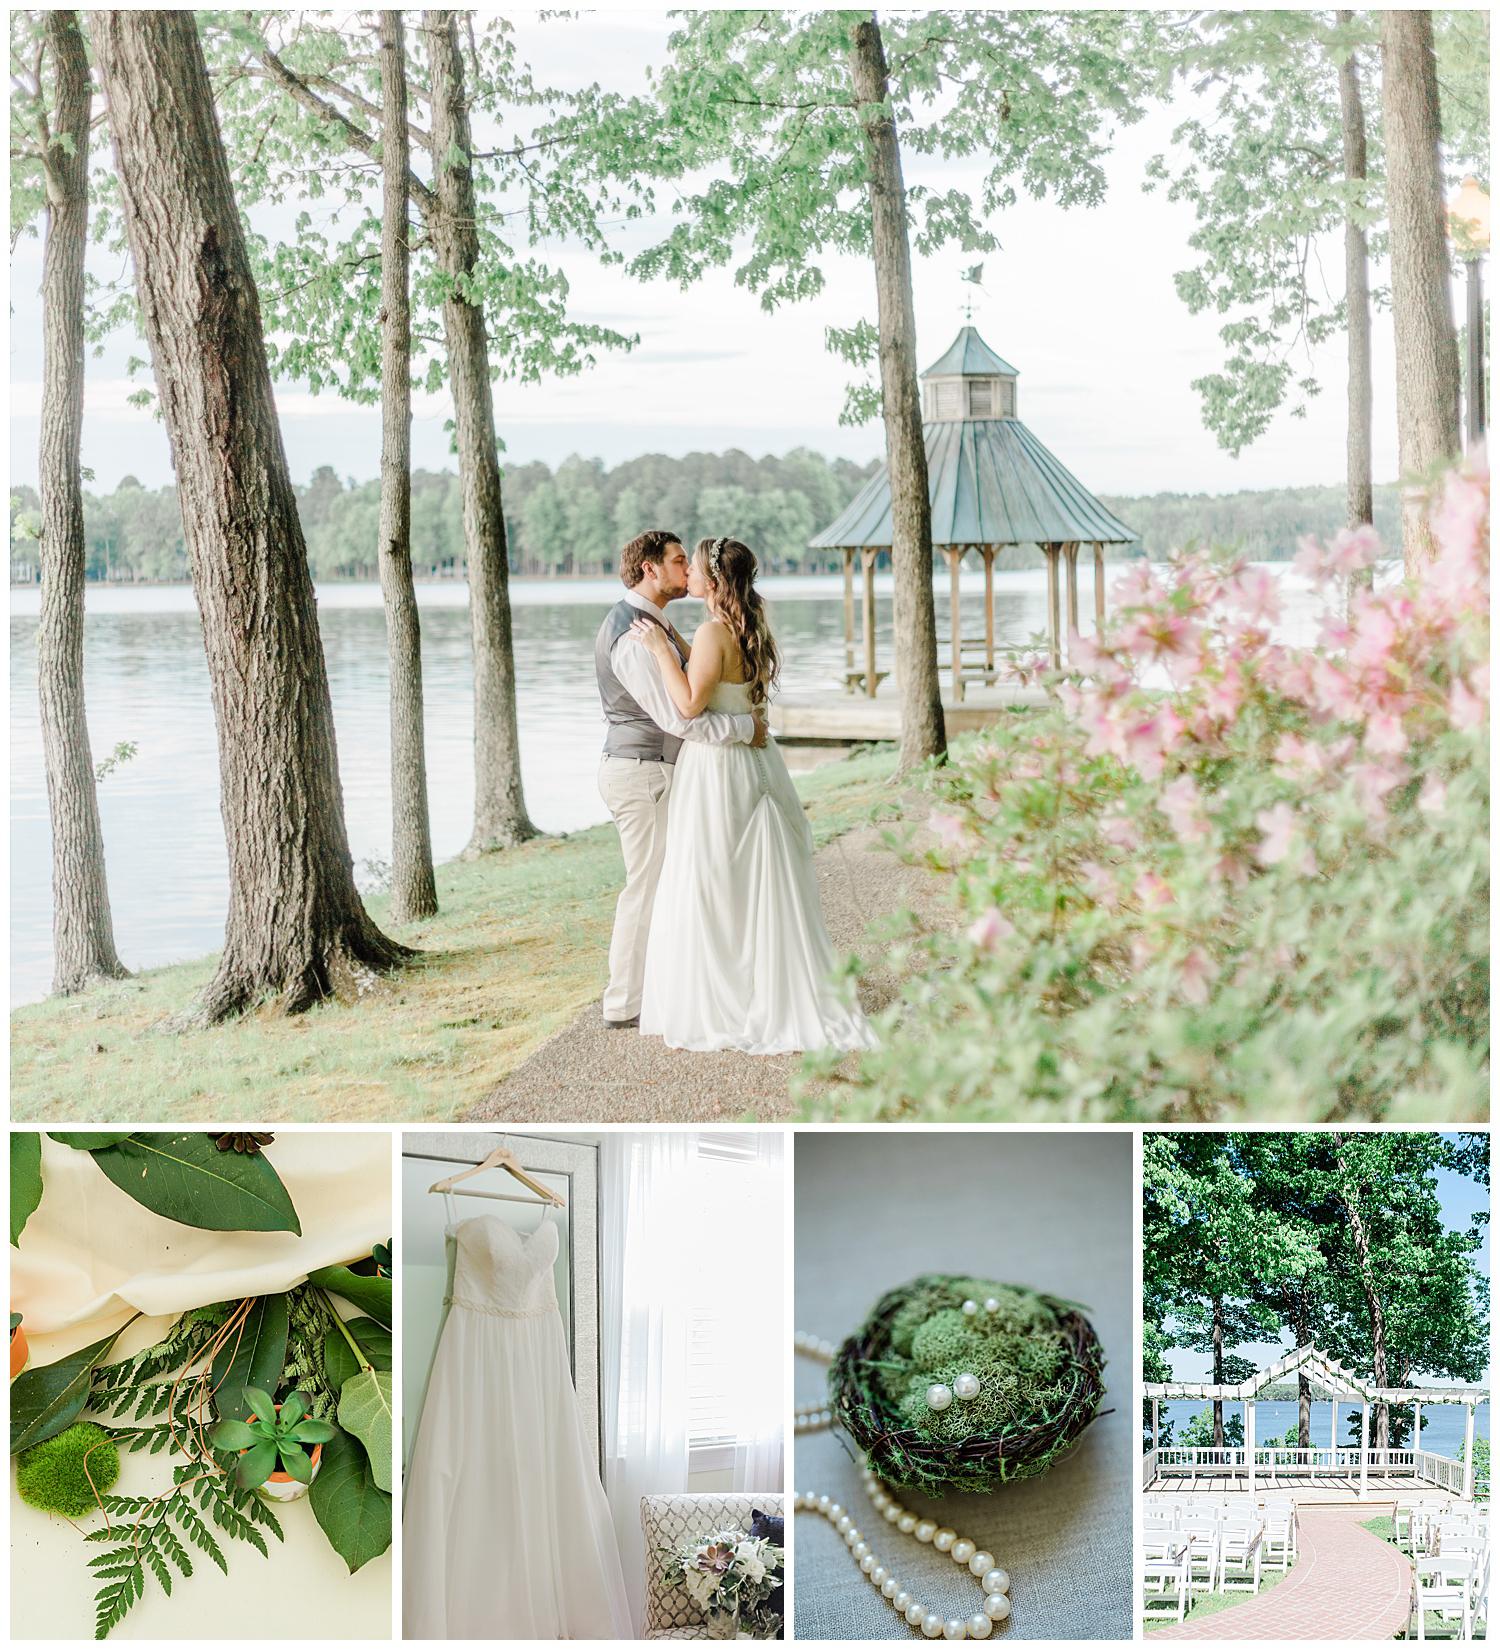 Celebrations at the Reservoir Wedding - Virginia Wedding Photographer